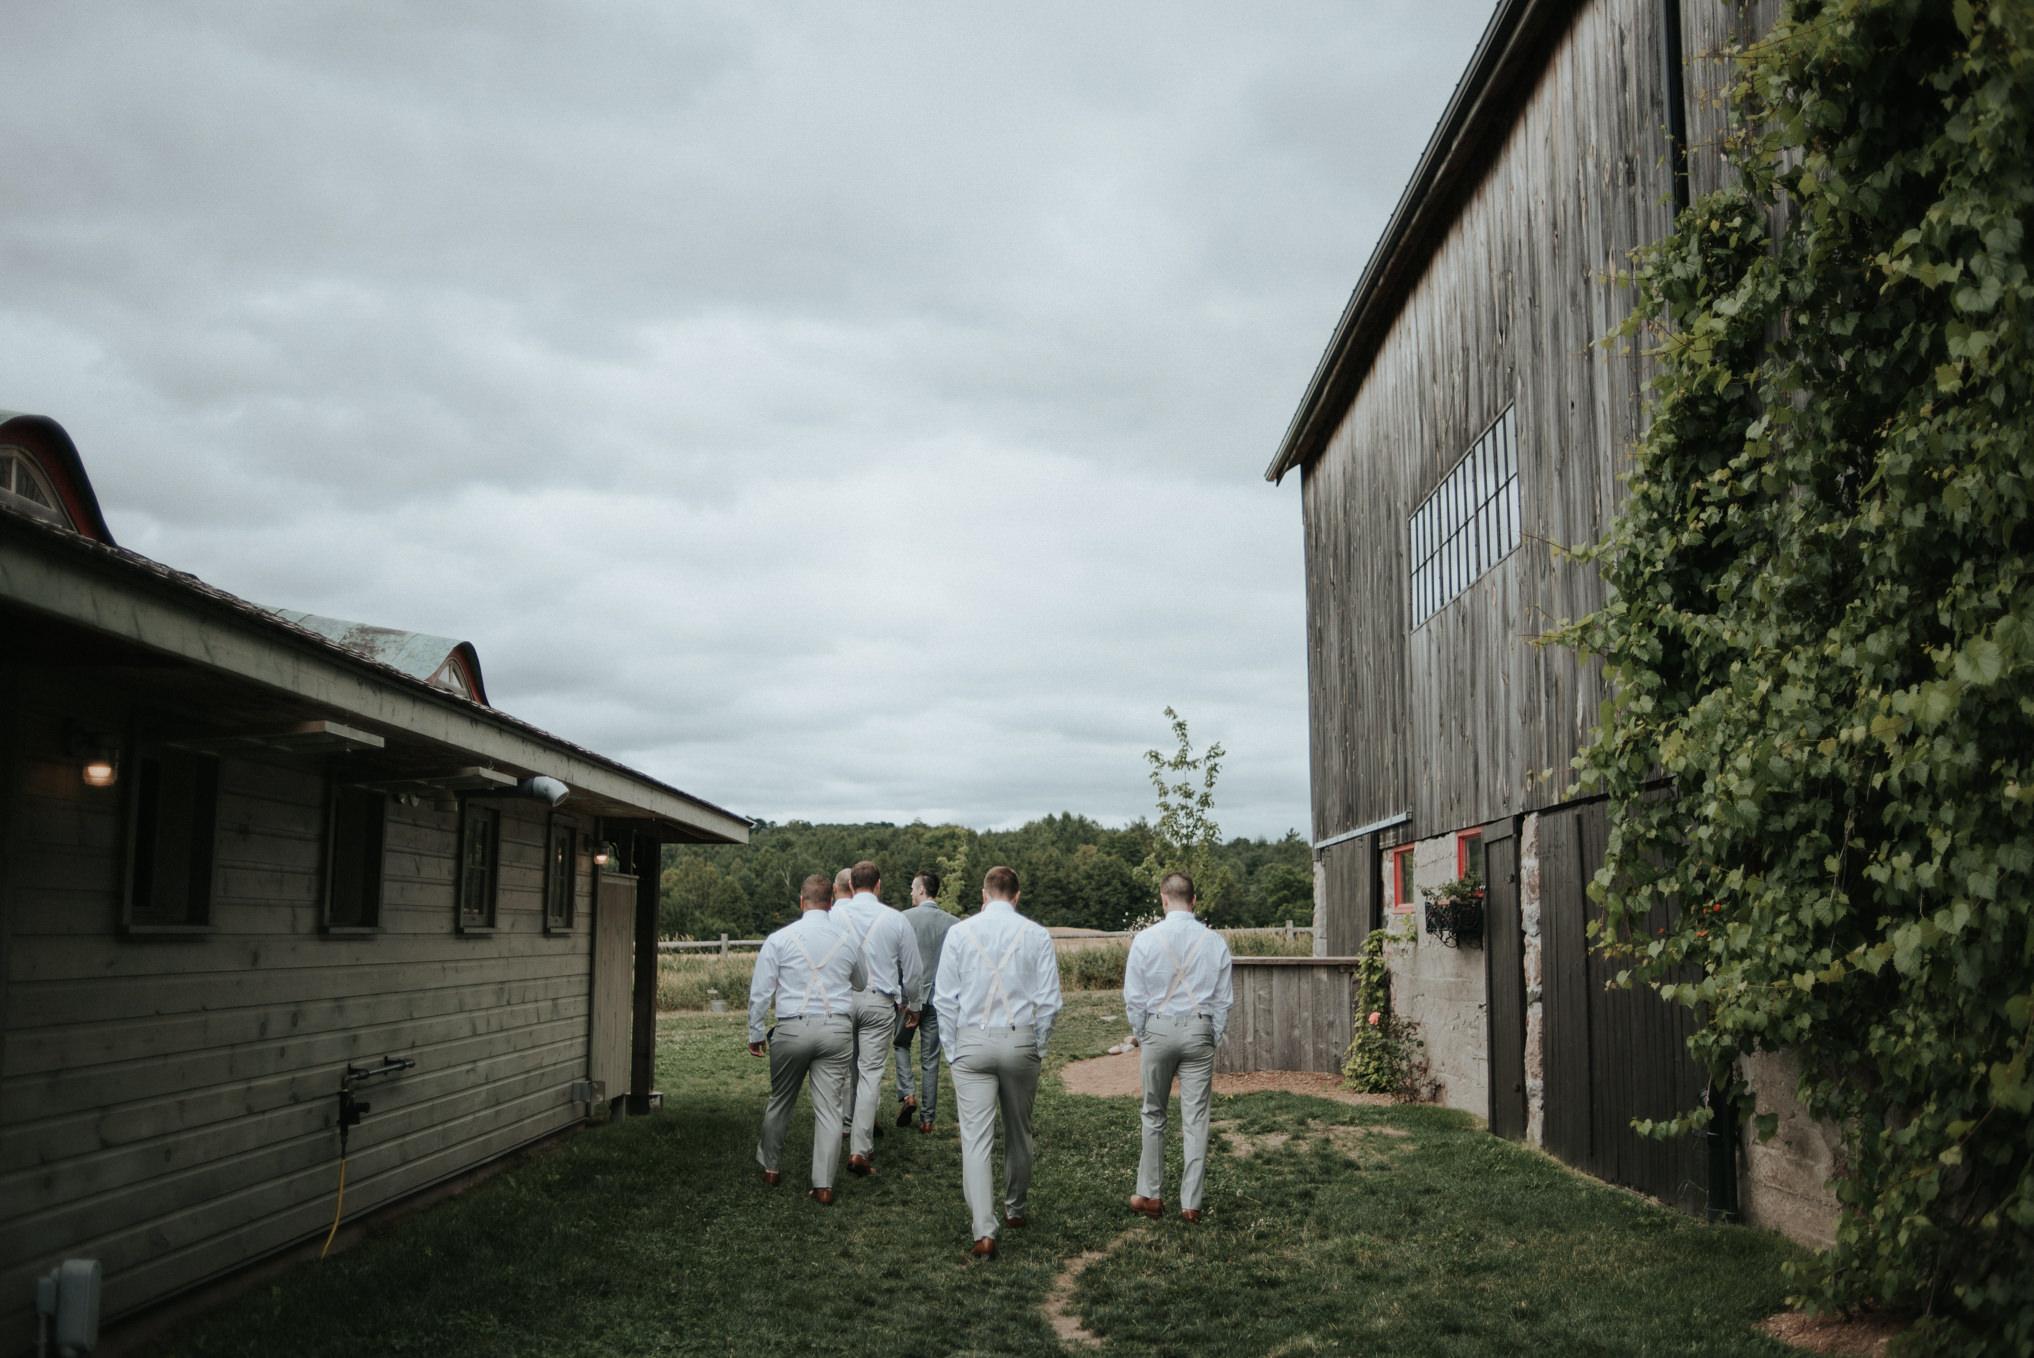 An intimate bohemian outdoor farm wedding at South Pond Farms // Daring Wanderer: www.daringwanderer.com